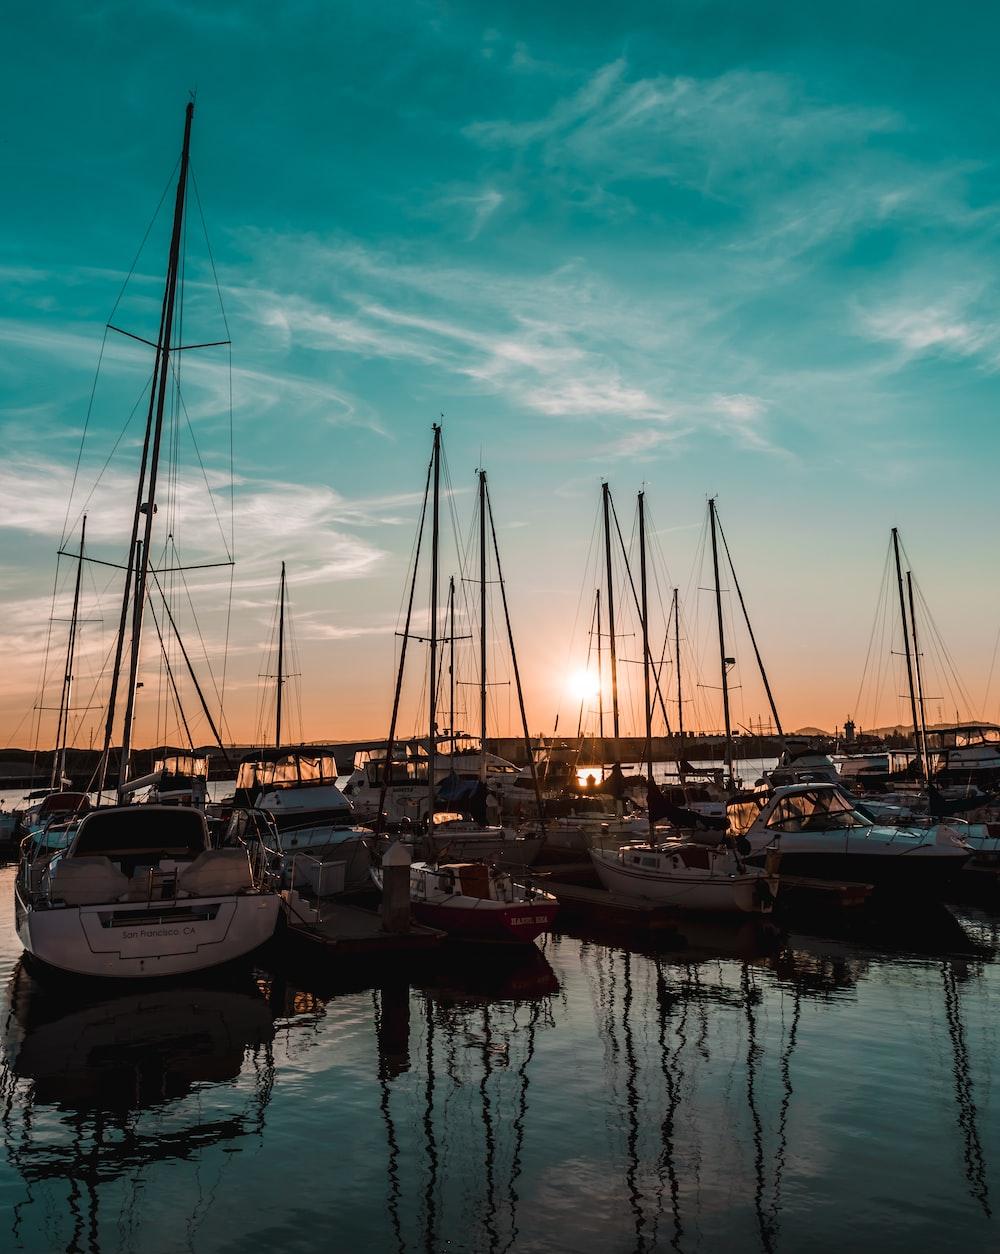 white sailboats under blue sky